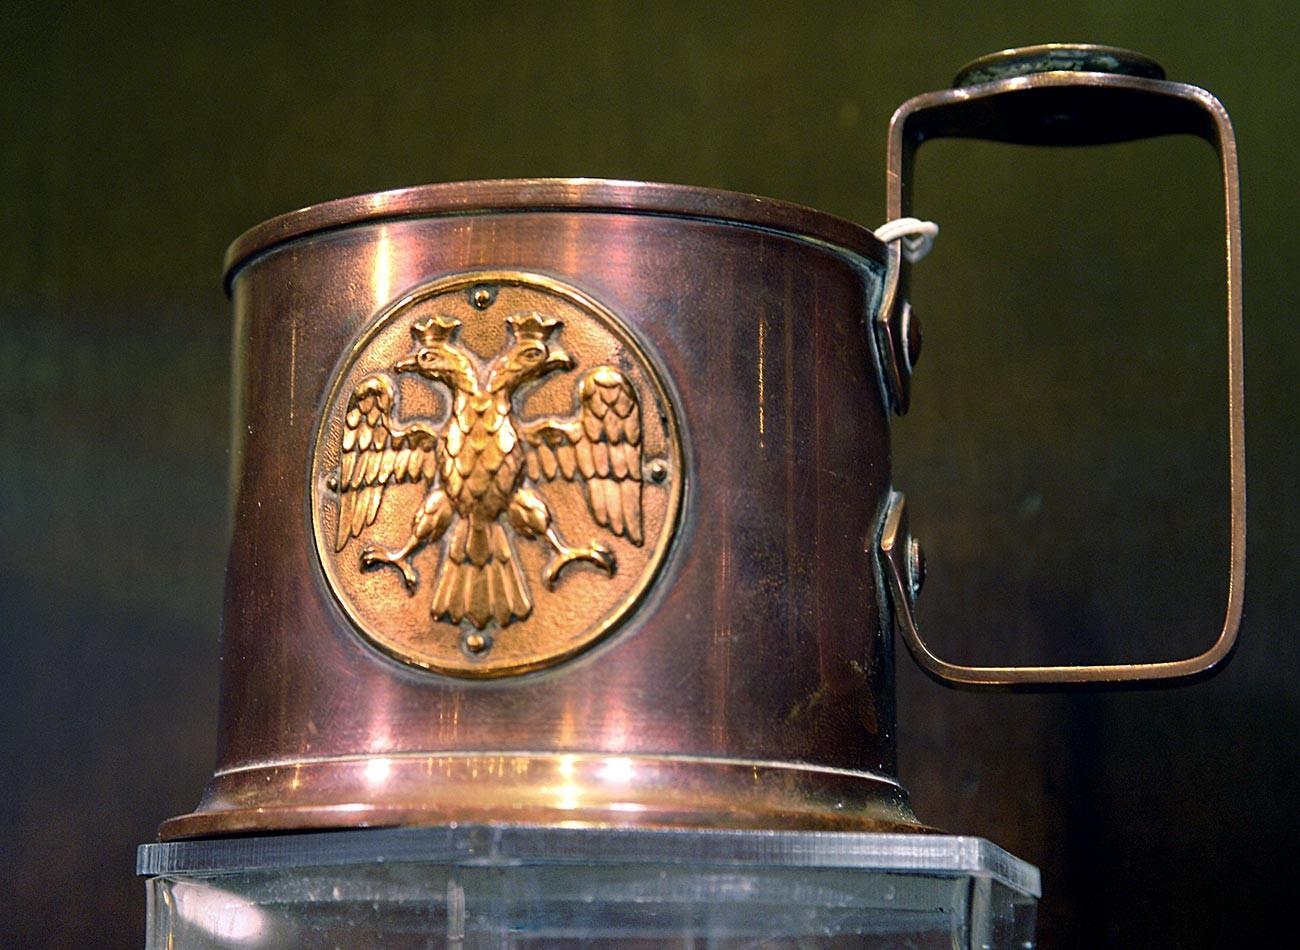 A podstakannik designed by Carl Faberge in 1914-1915